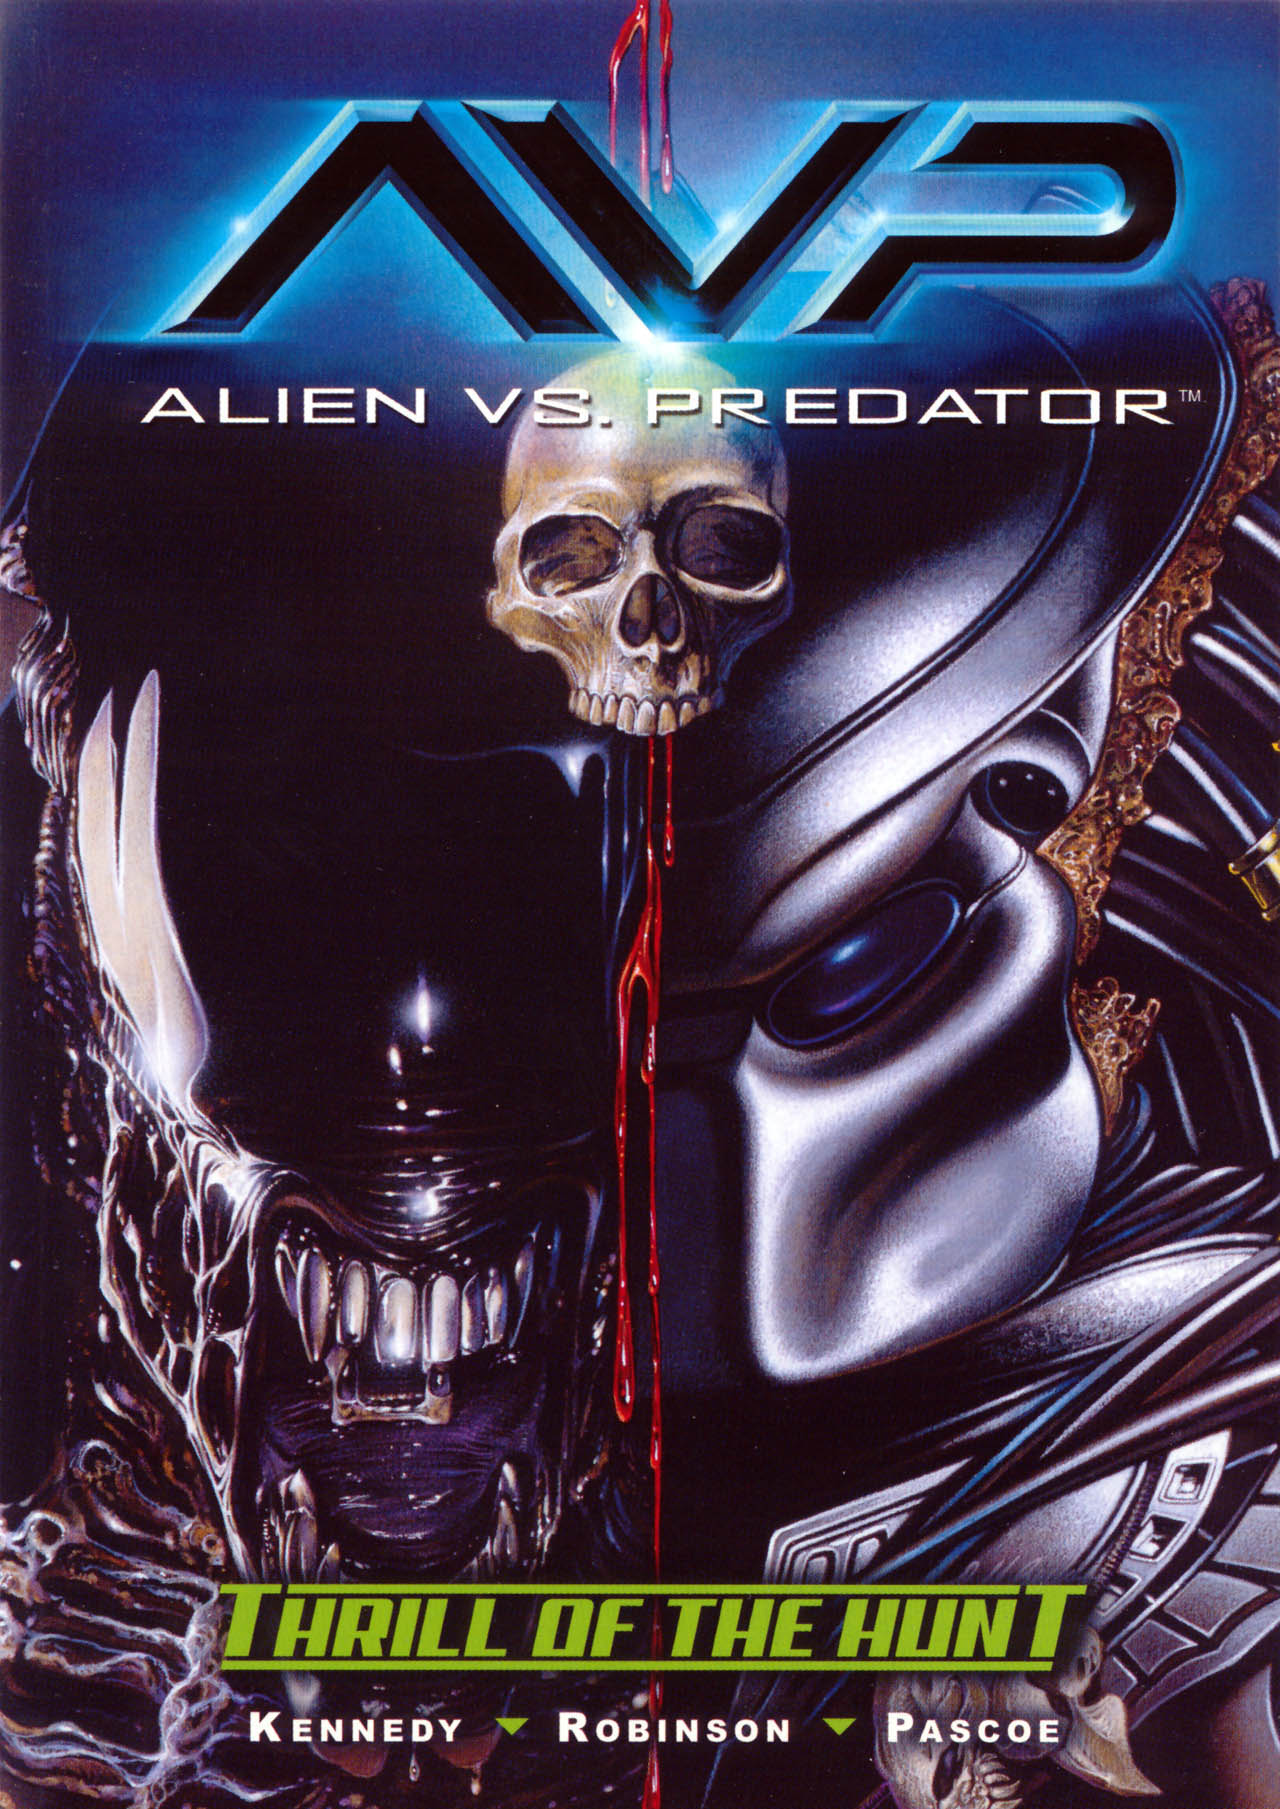 Alien vs. Predator: Thrill of the Hunt TPB Page 1